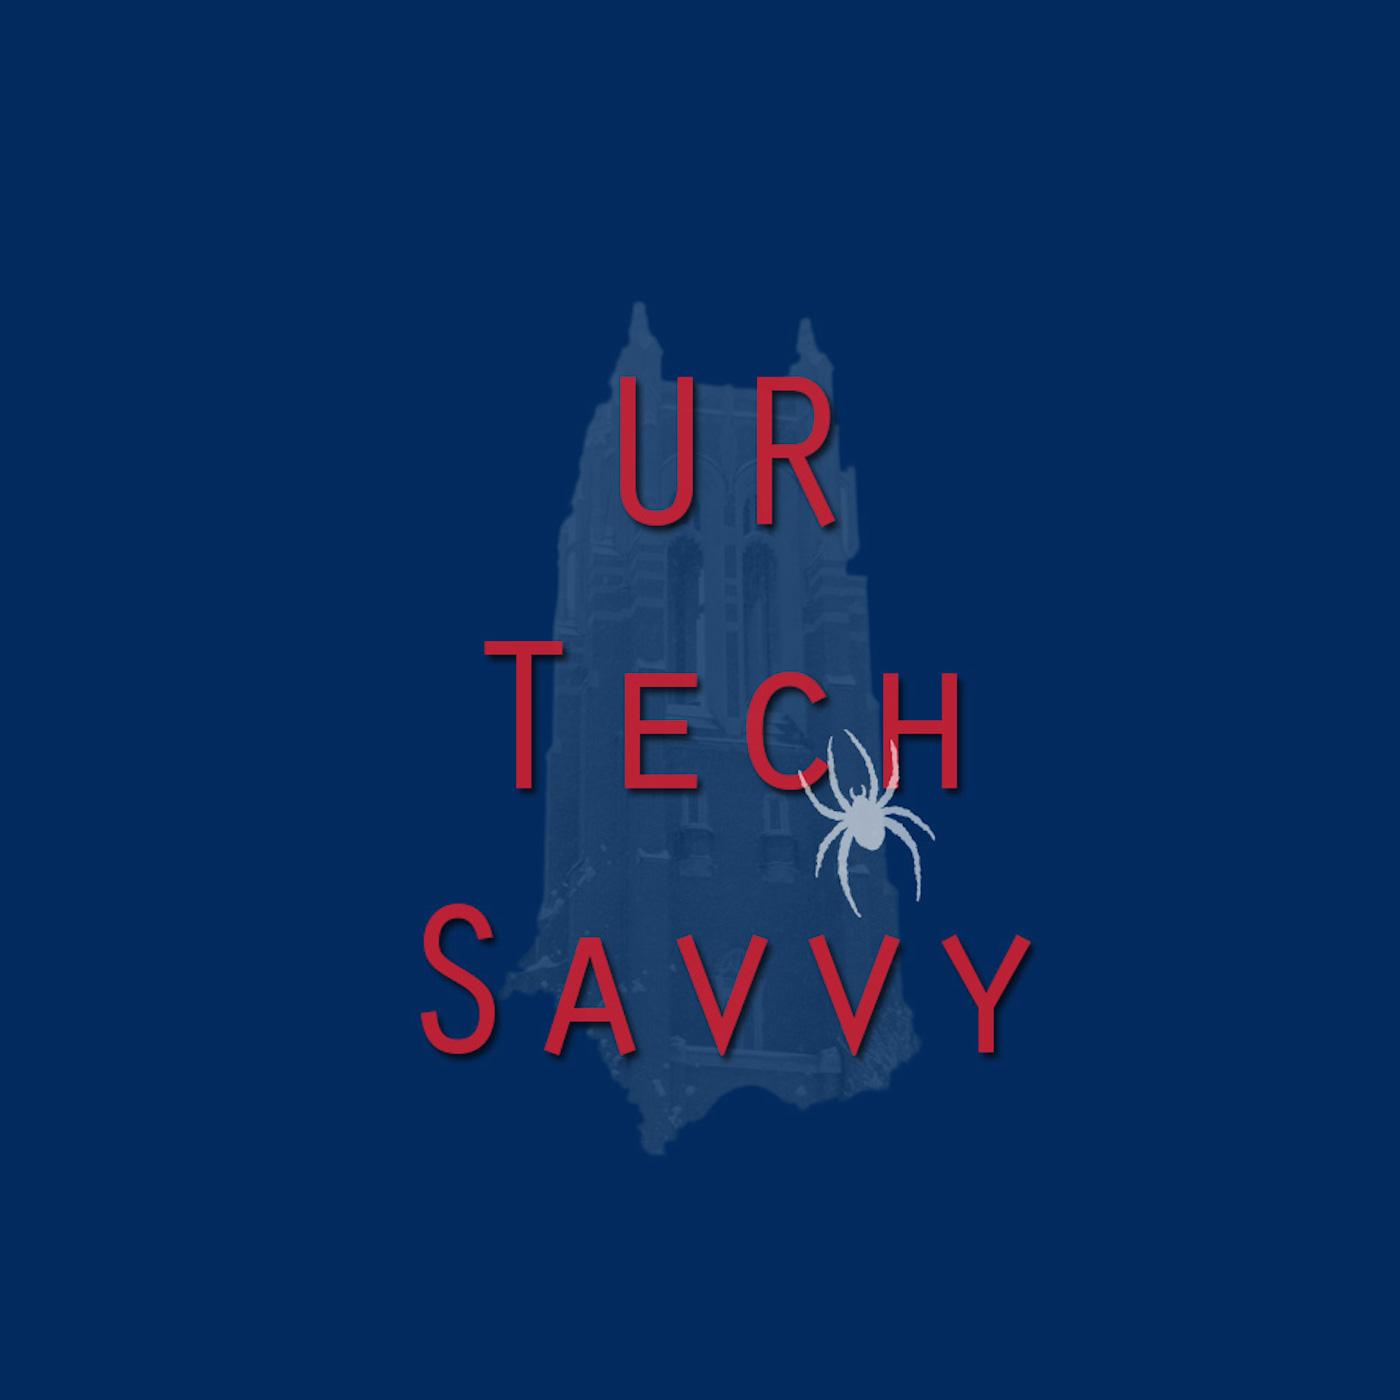 UR Tech Savvy